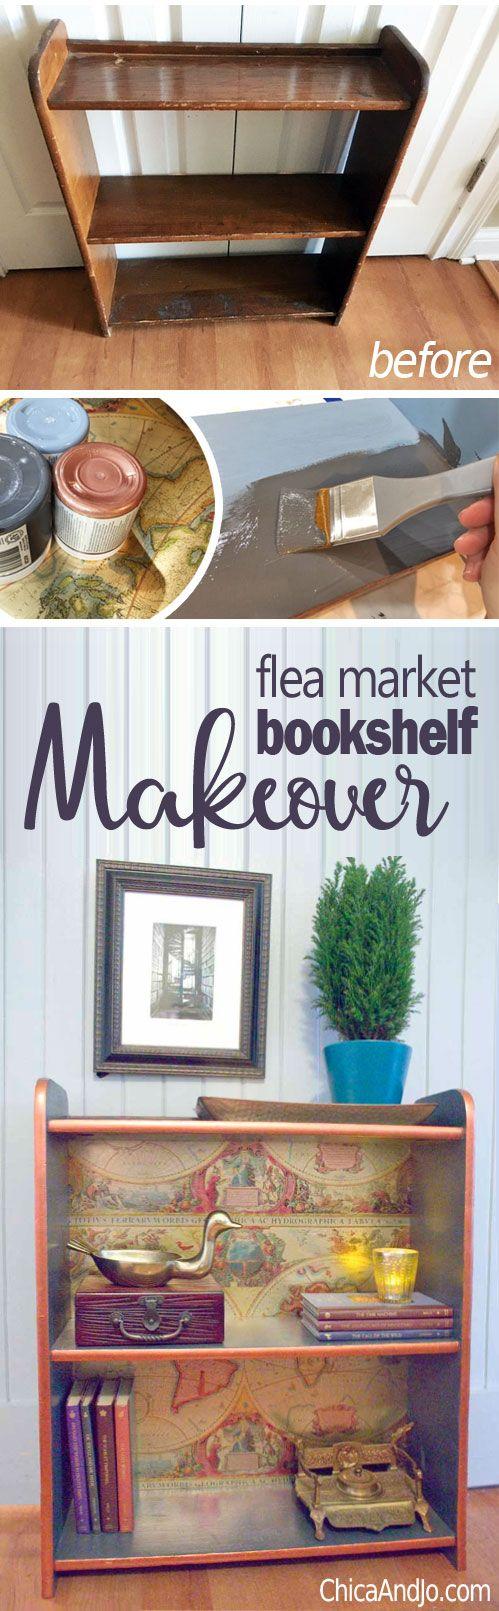 Flea market bookshelf makeover | Chica and Jo